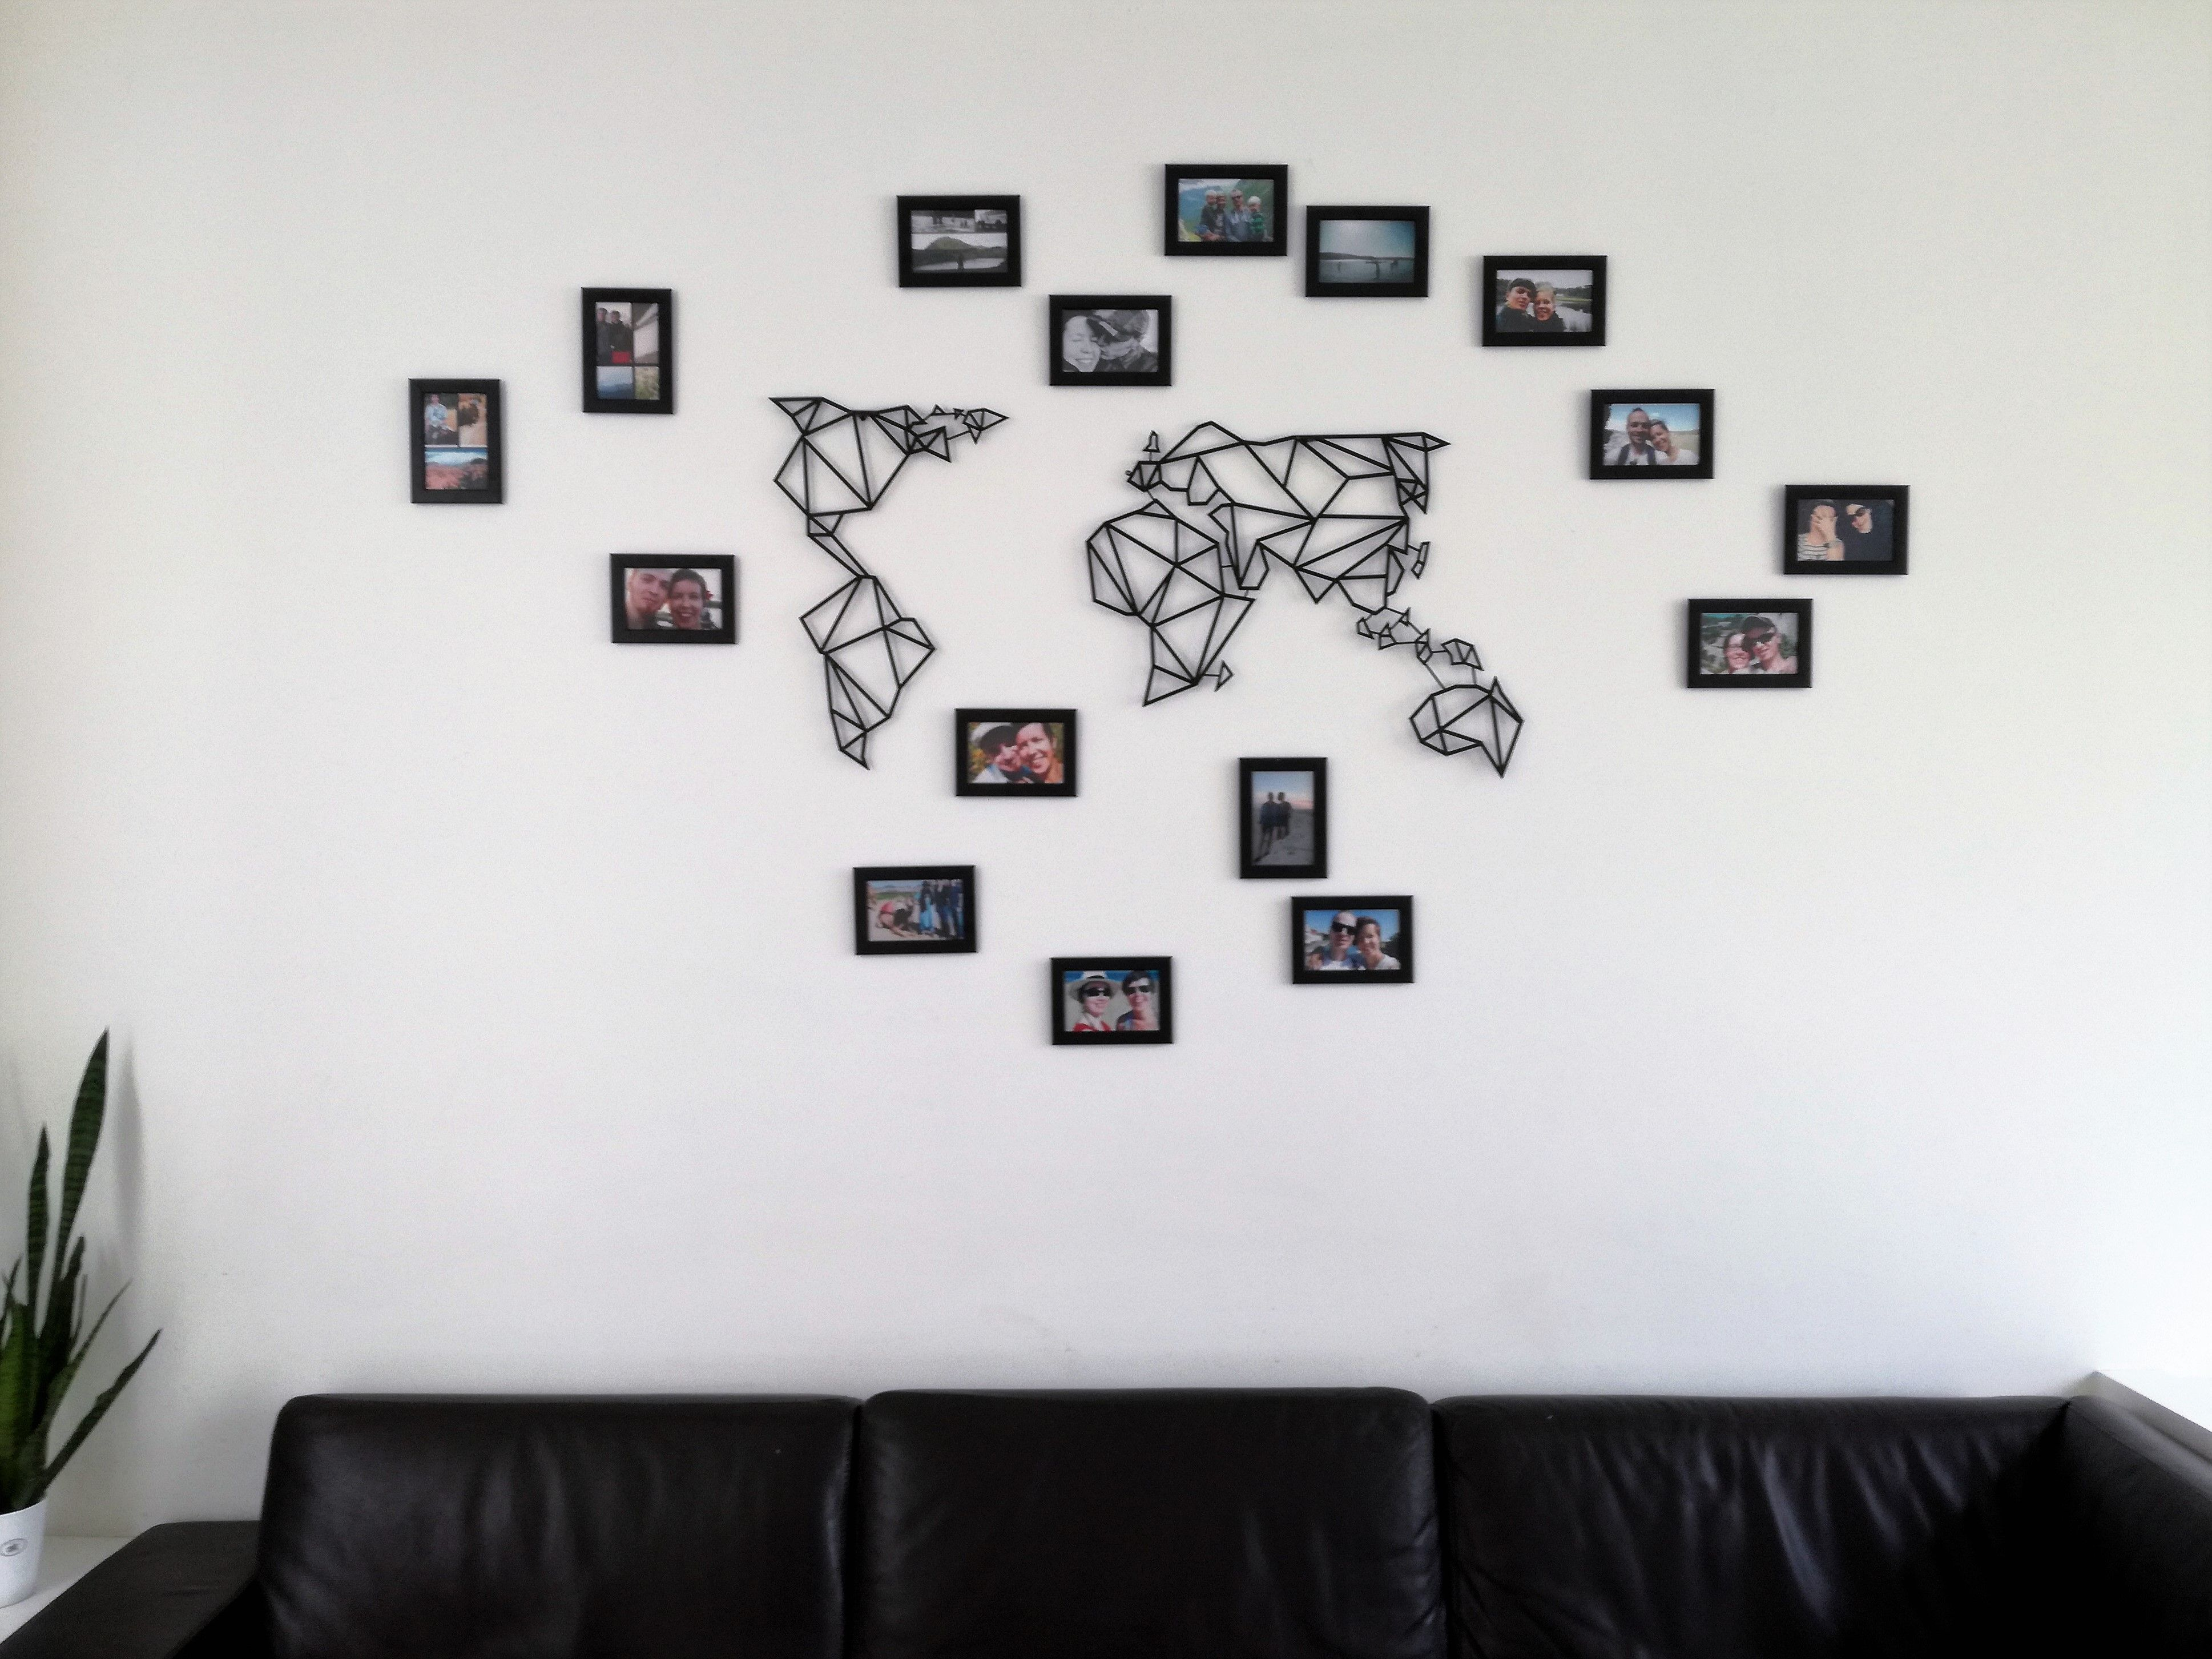 Memoboard Kinderzimmer ~ Https: lienvoets.wordpress.com wall deco world map thuis en toch